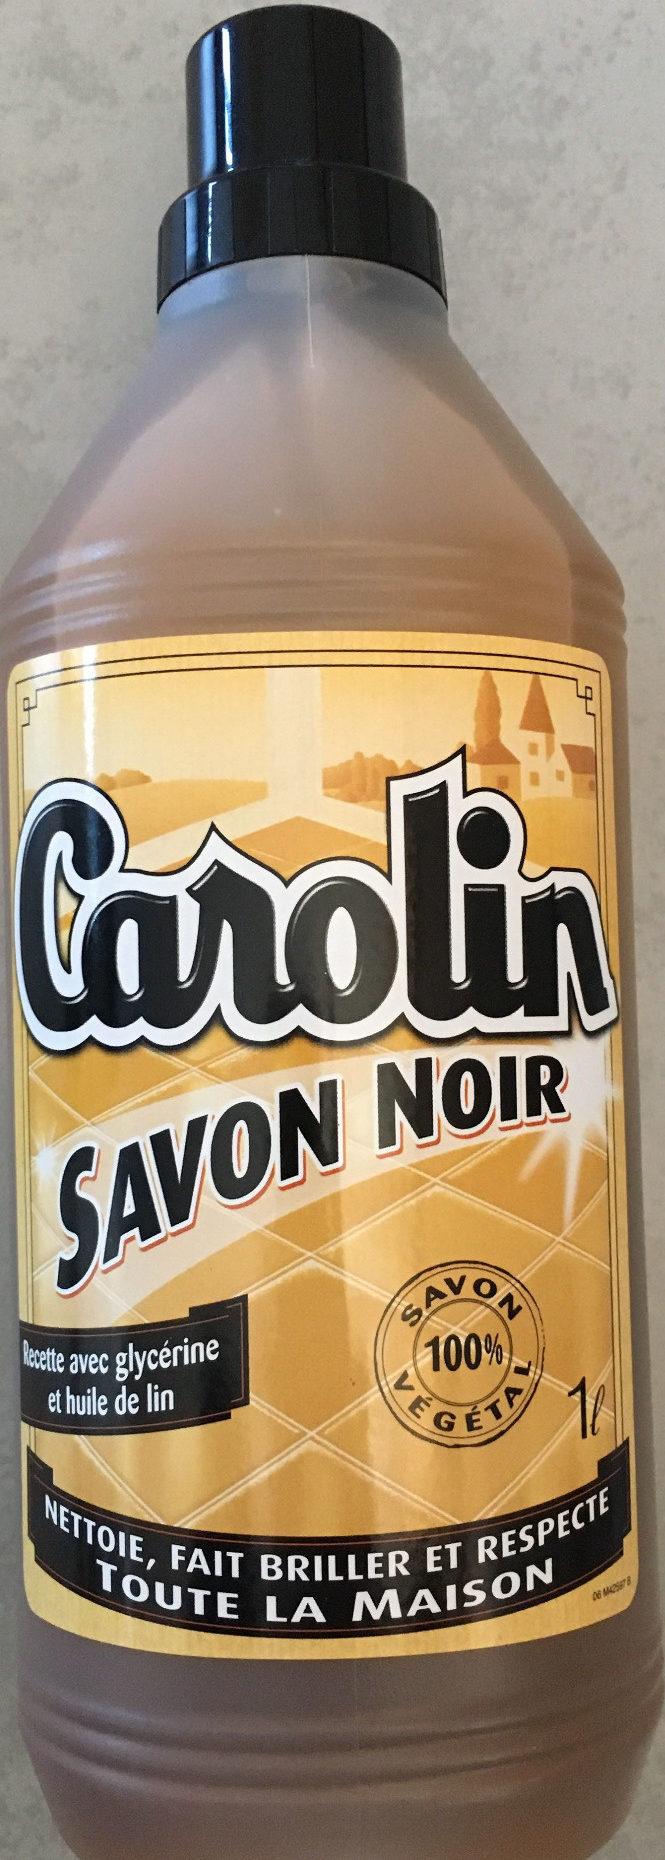 Flacon 1L Savon Noir Carolin - Produit